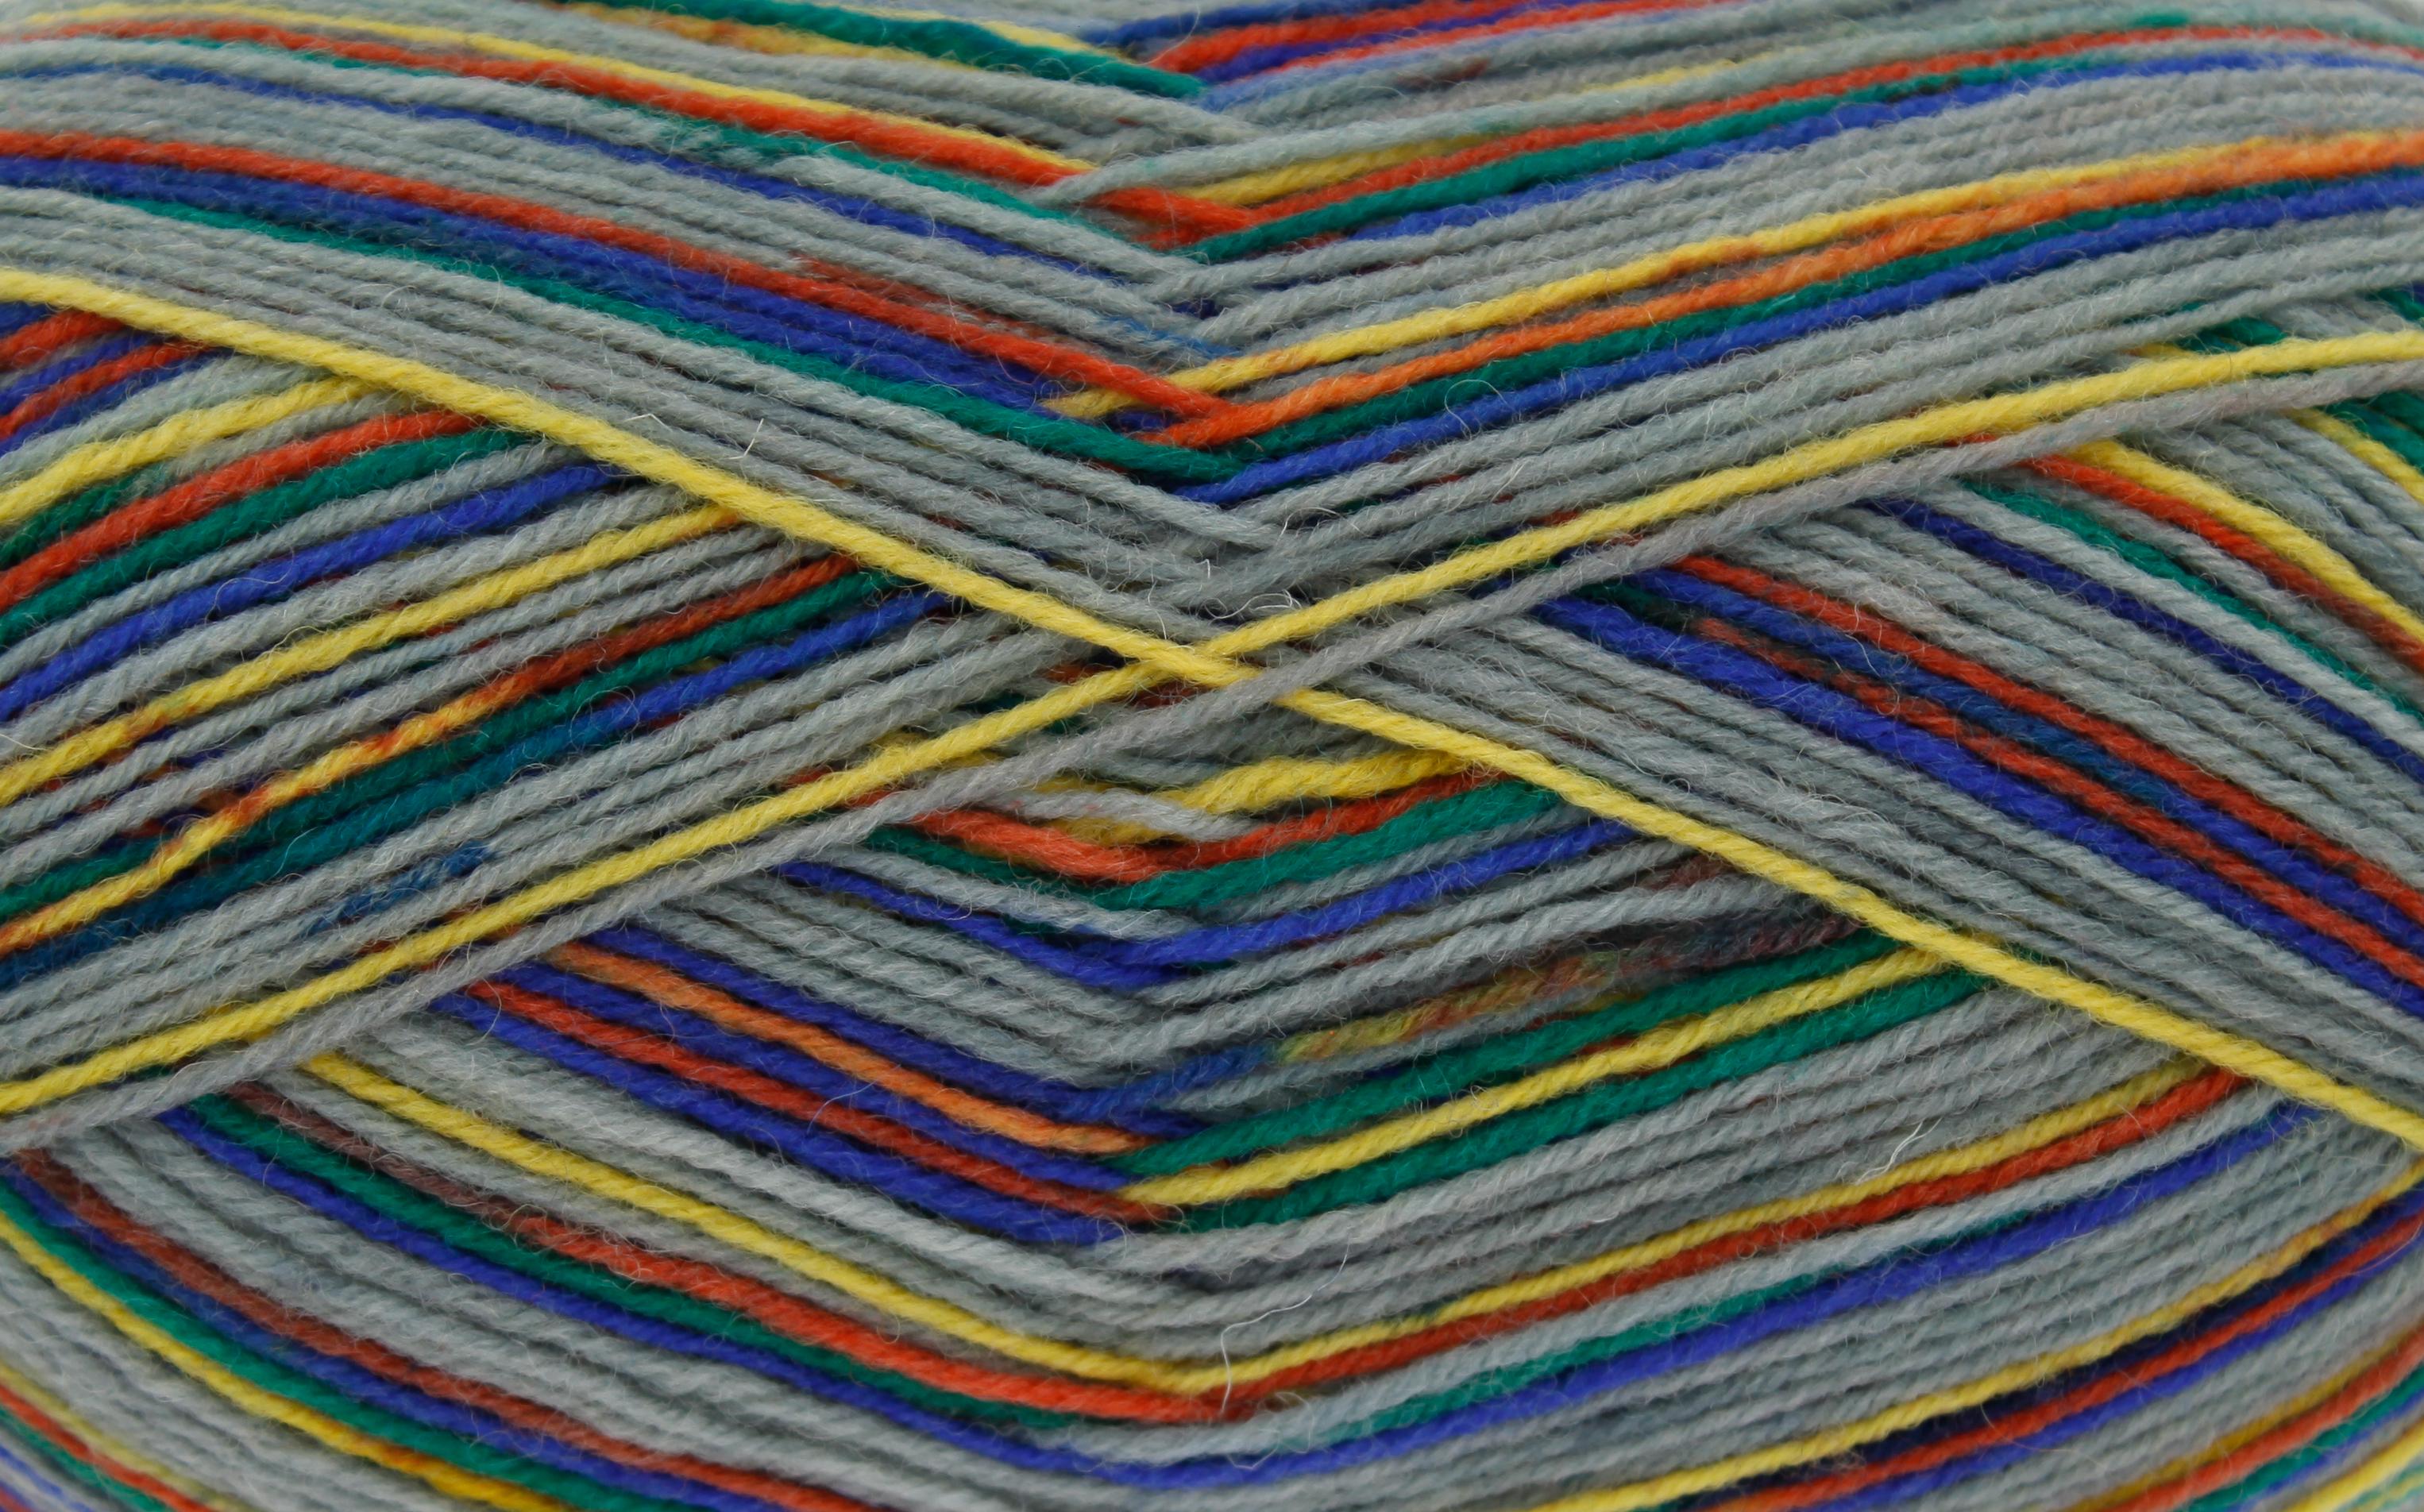 King Cole Zig Zag 4ply Sockenwolle in aufregend selbstmusternden Farbtönen